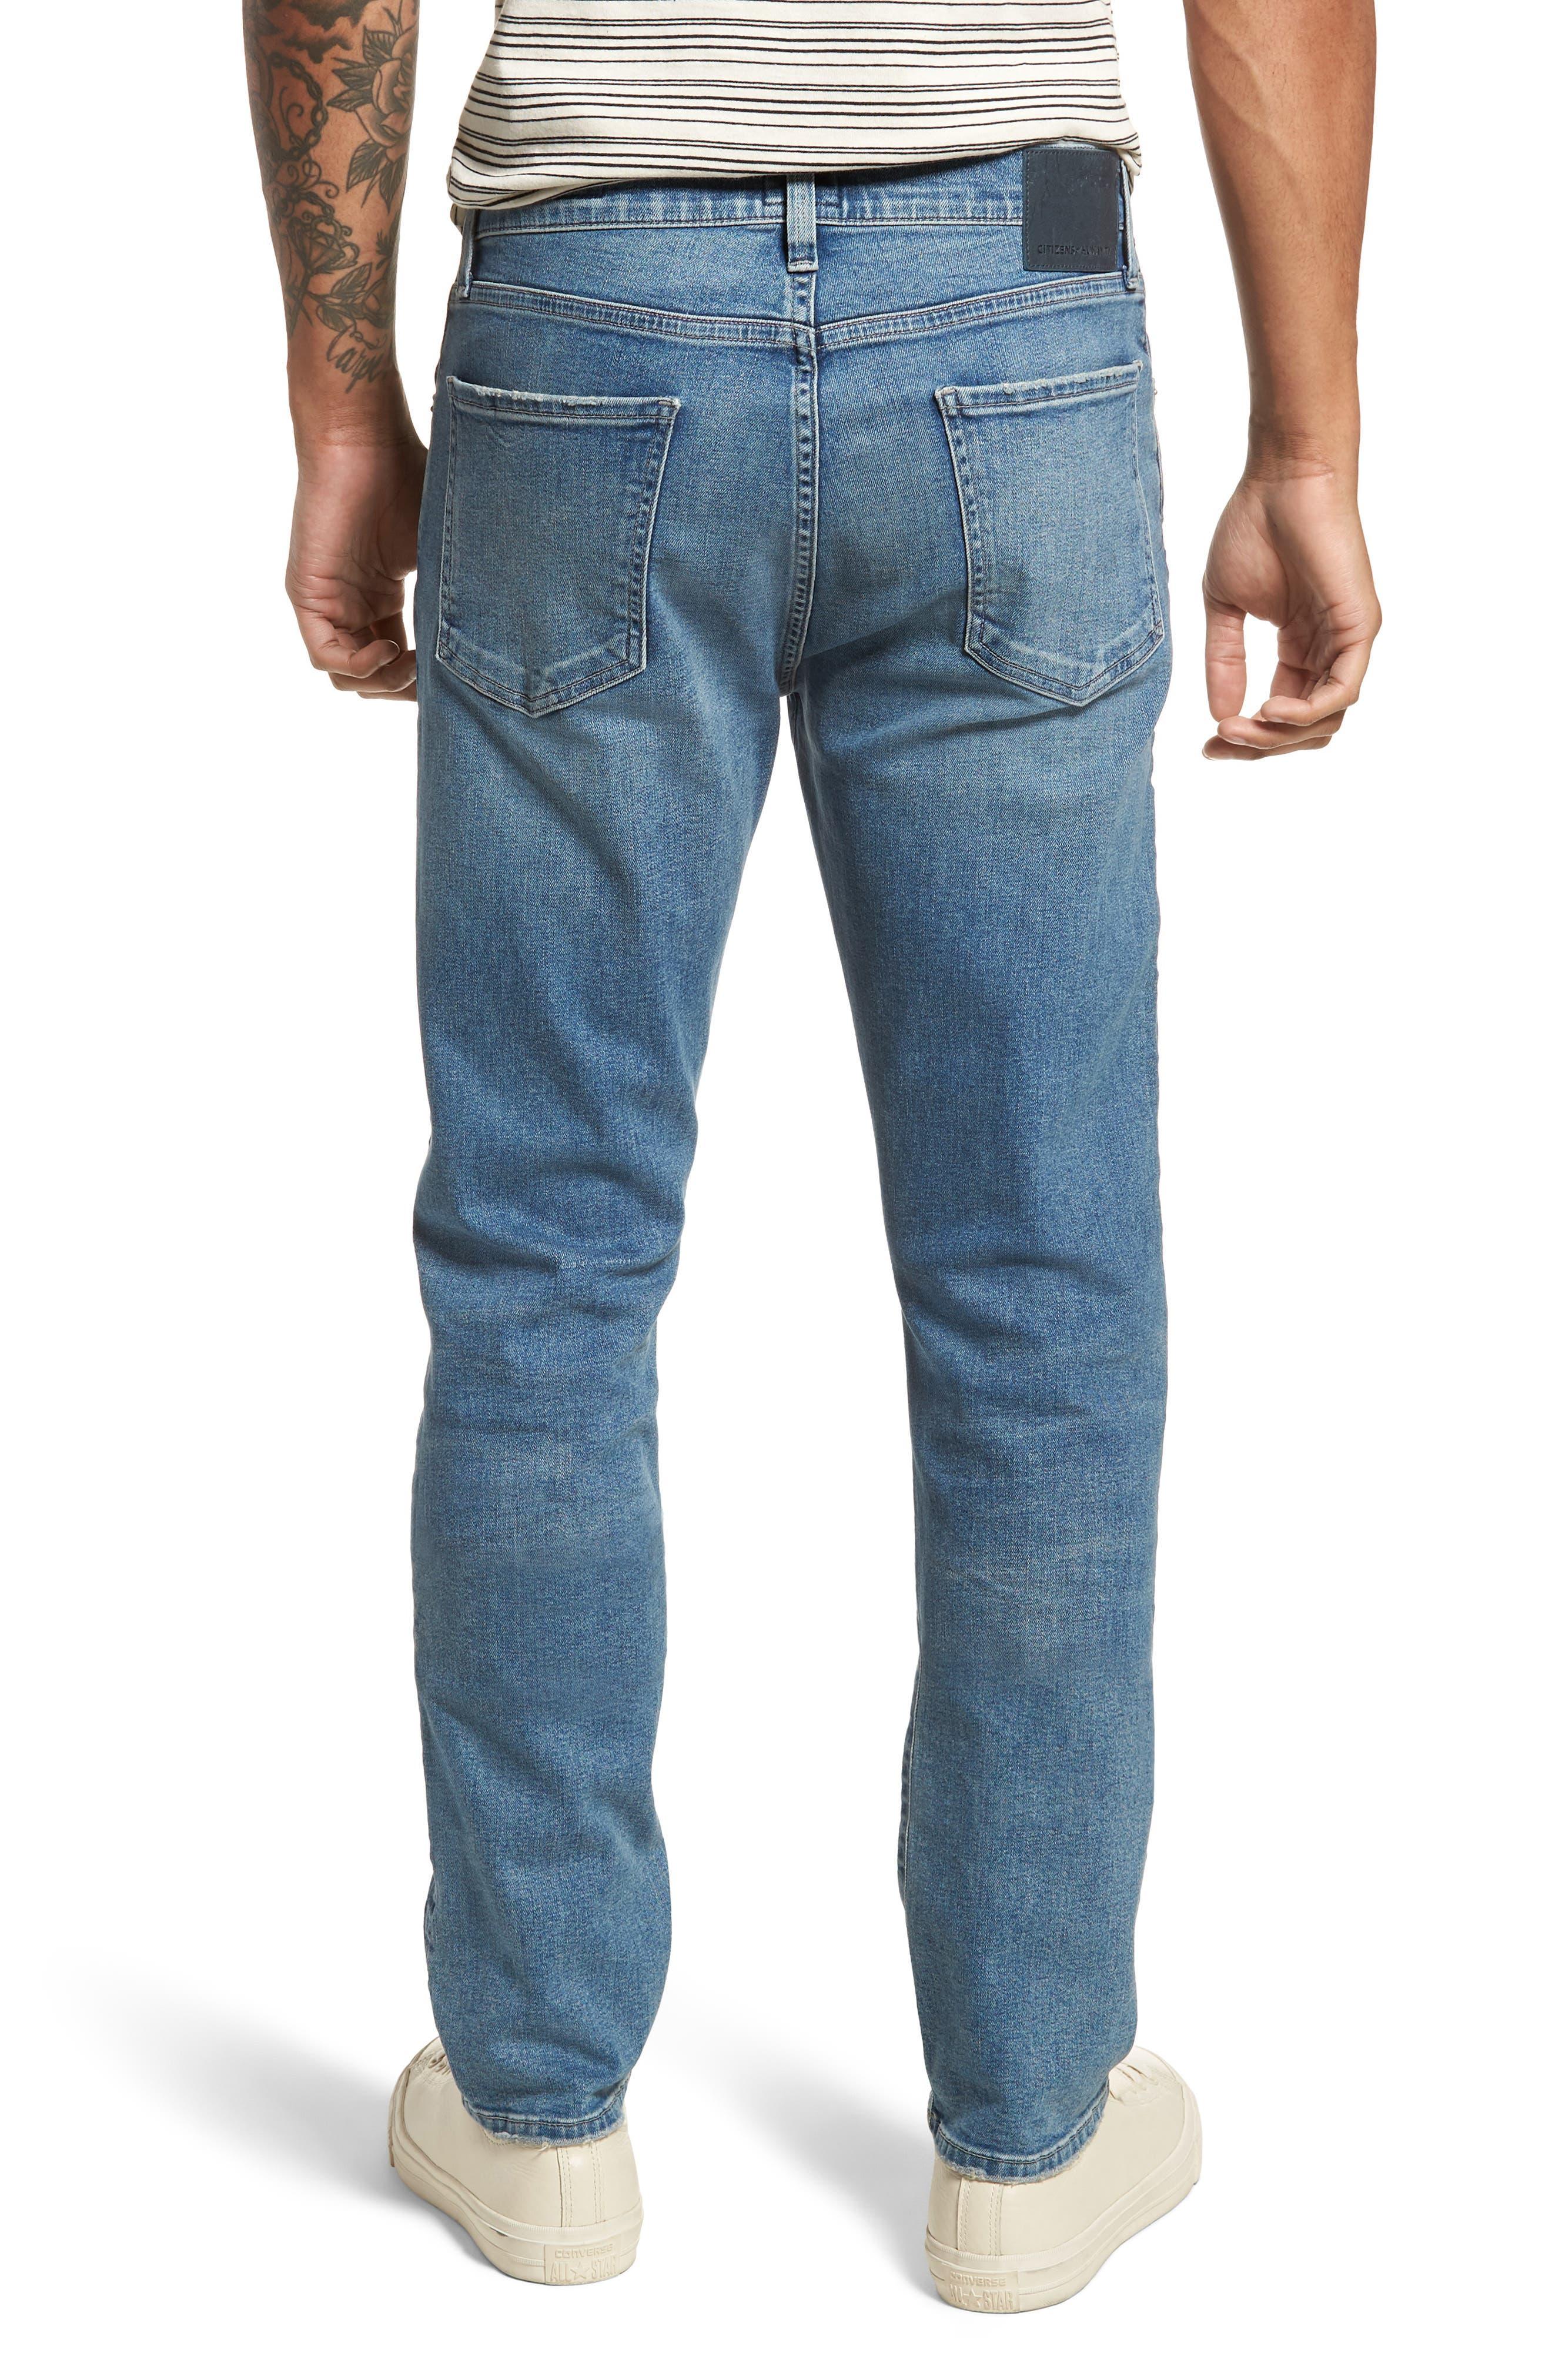 Perform - Gage Slim Straight Leg Jeans,                             Alternate thumbnail 2, color,                             473